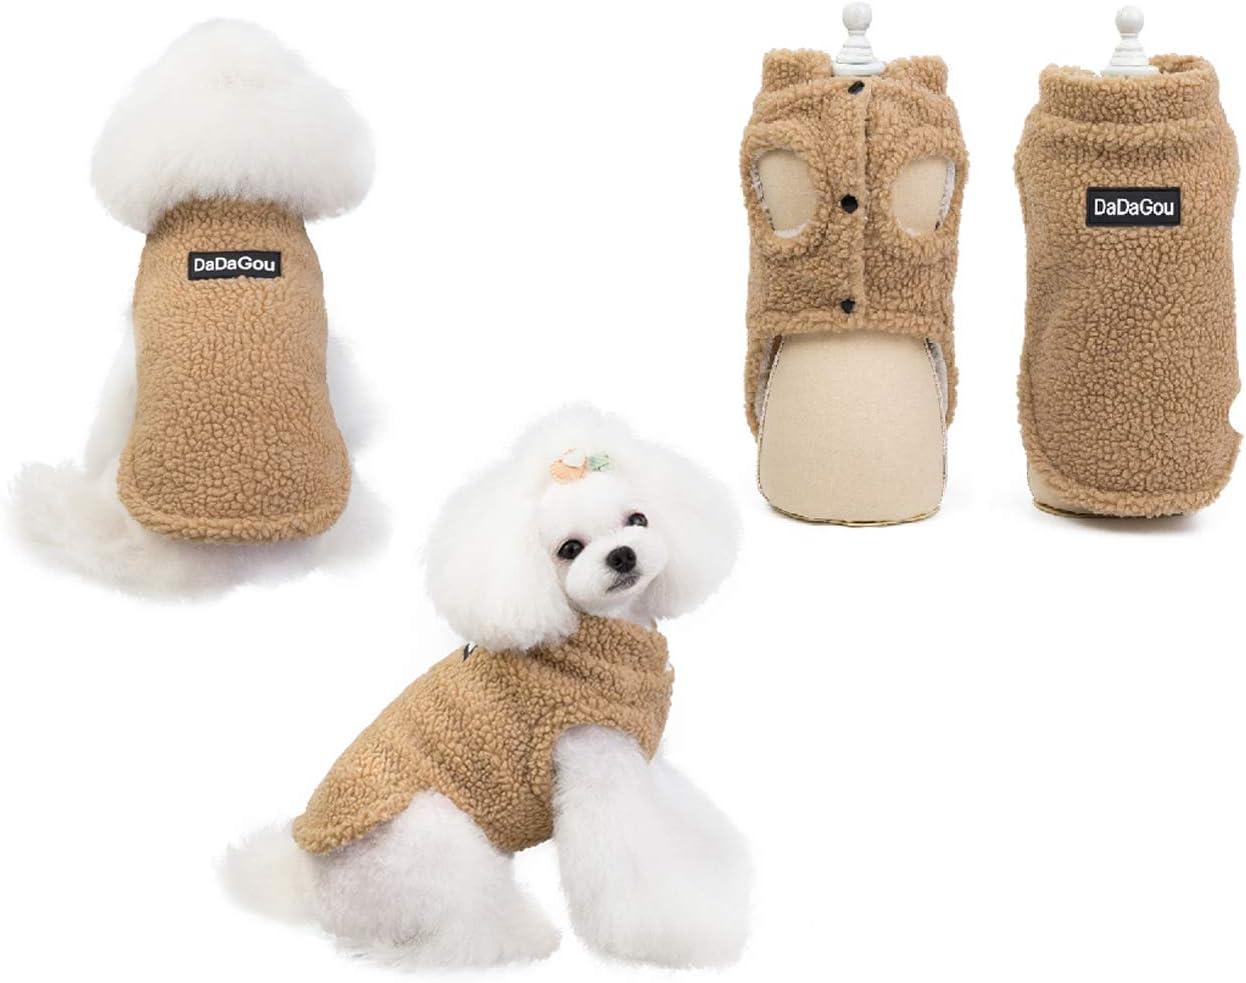 Tineer Pet Doggy Winter Lamb Cachemira Abrigo Warm Outdoor Fleece Dog Fleece Forro Pullover Coat Chaqueta Outwear Chaleco para Perros pequeños y medianos (S, Khaki)